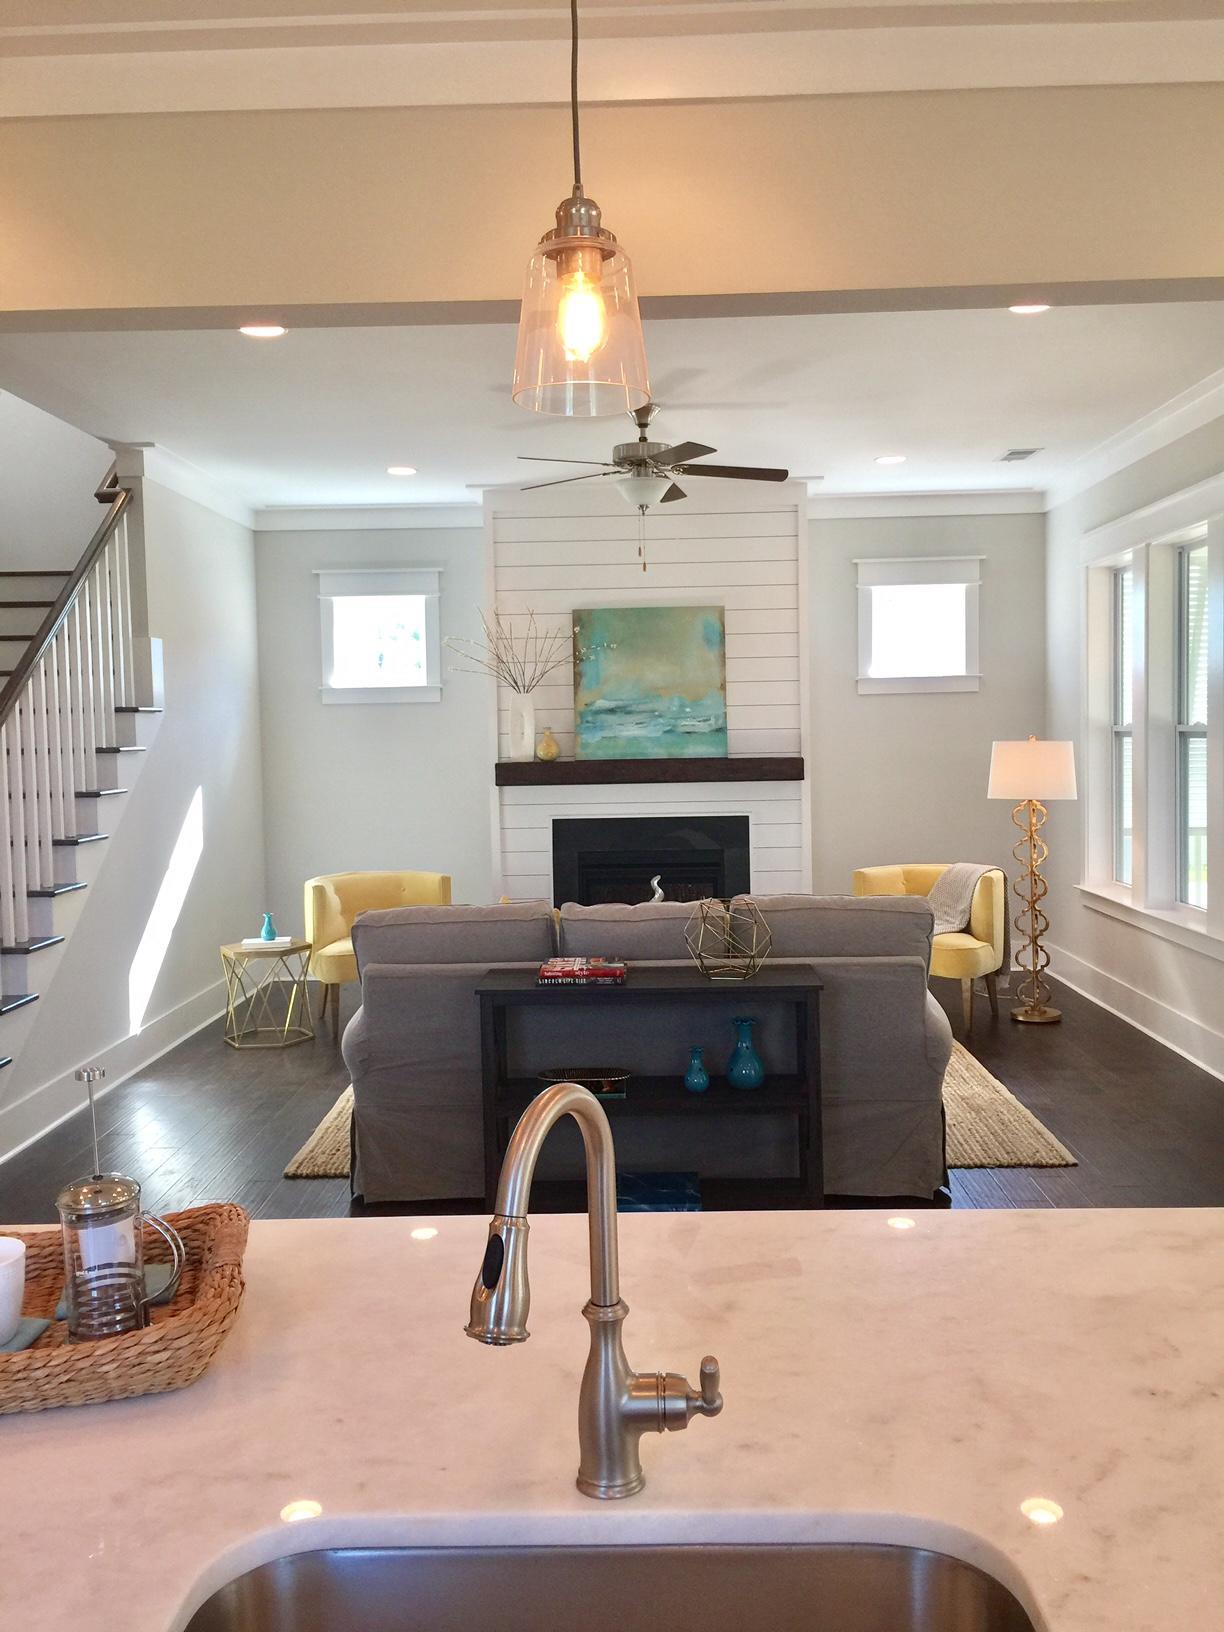 Stonoview Homes For Sale - 2670 Colonel Harrison, Johns Island, SC - 3